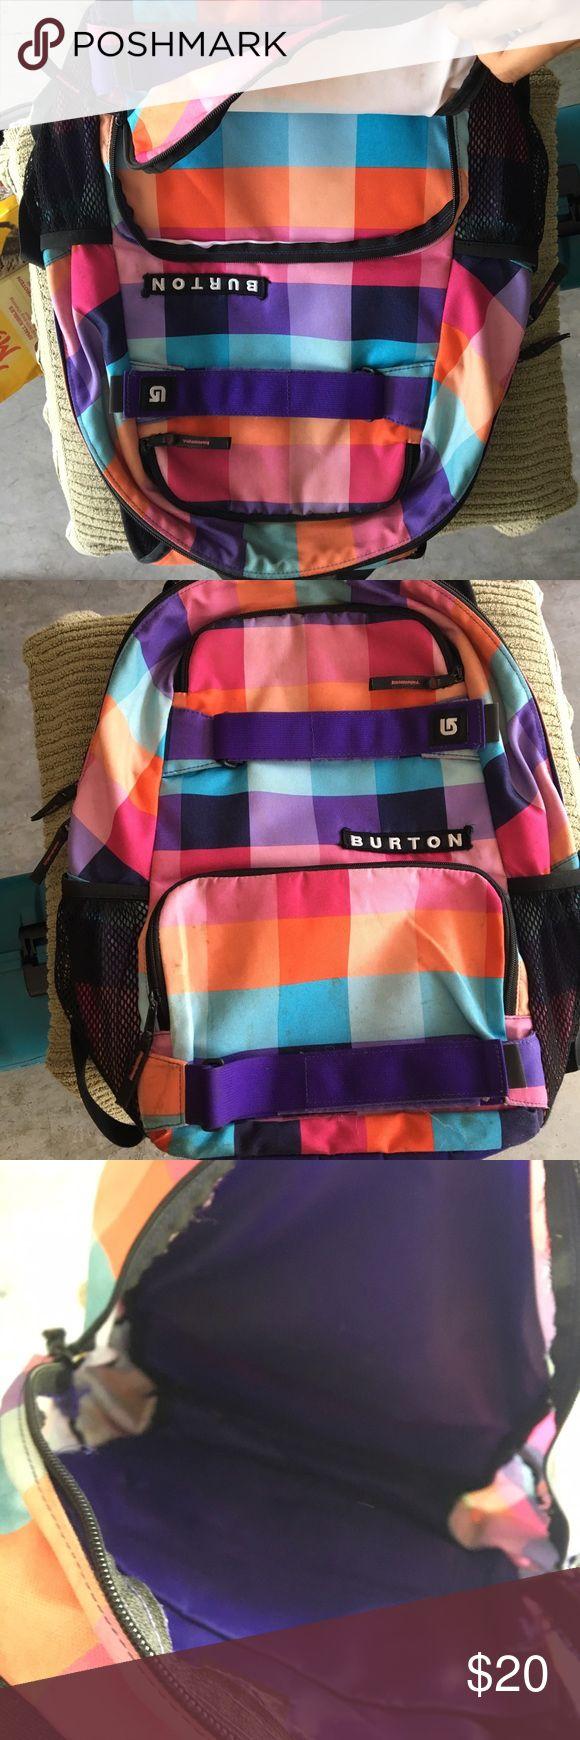 Burton bookbag Like new! In great condition!! Burton Bags Backpacks